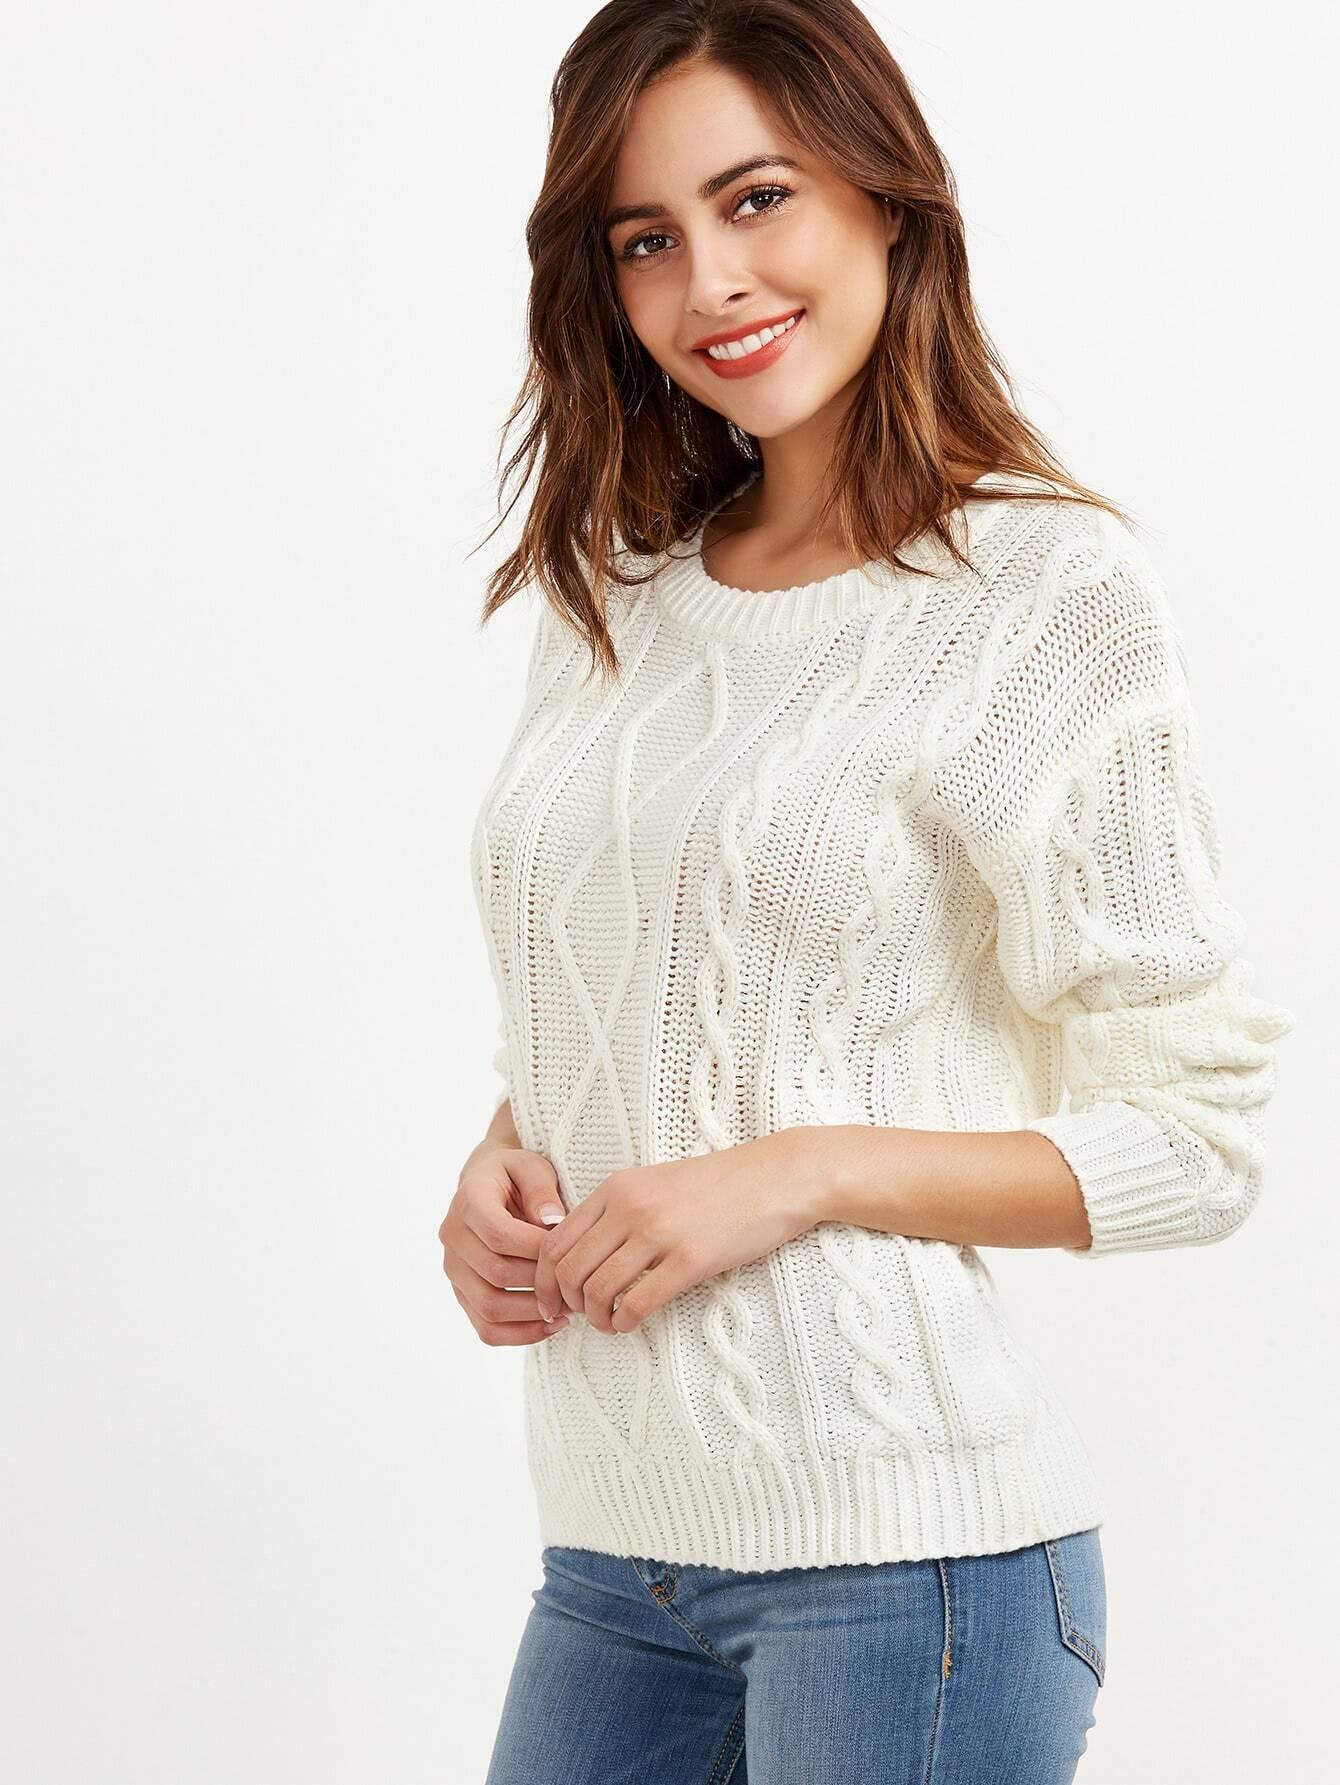 sweater160929463_2